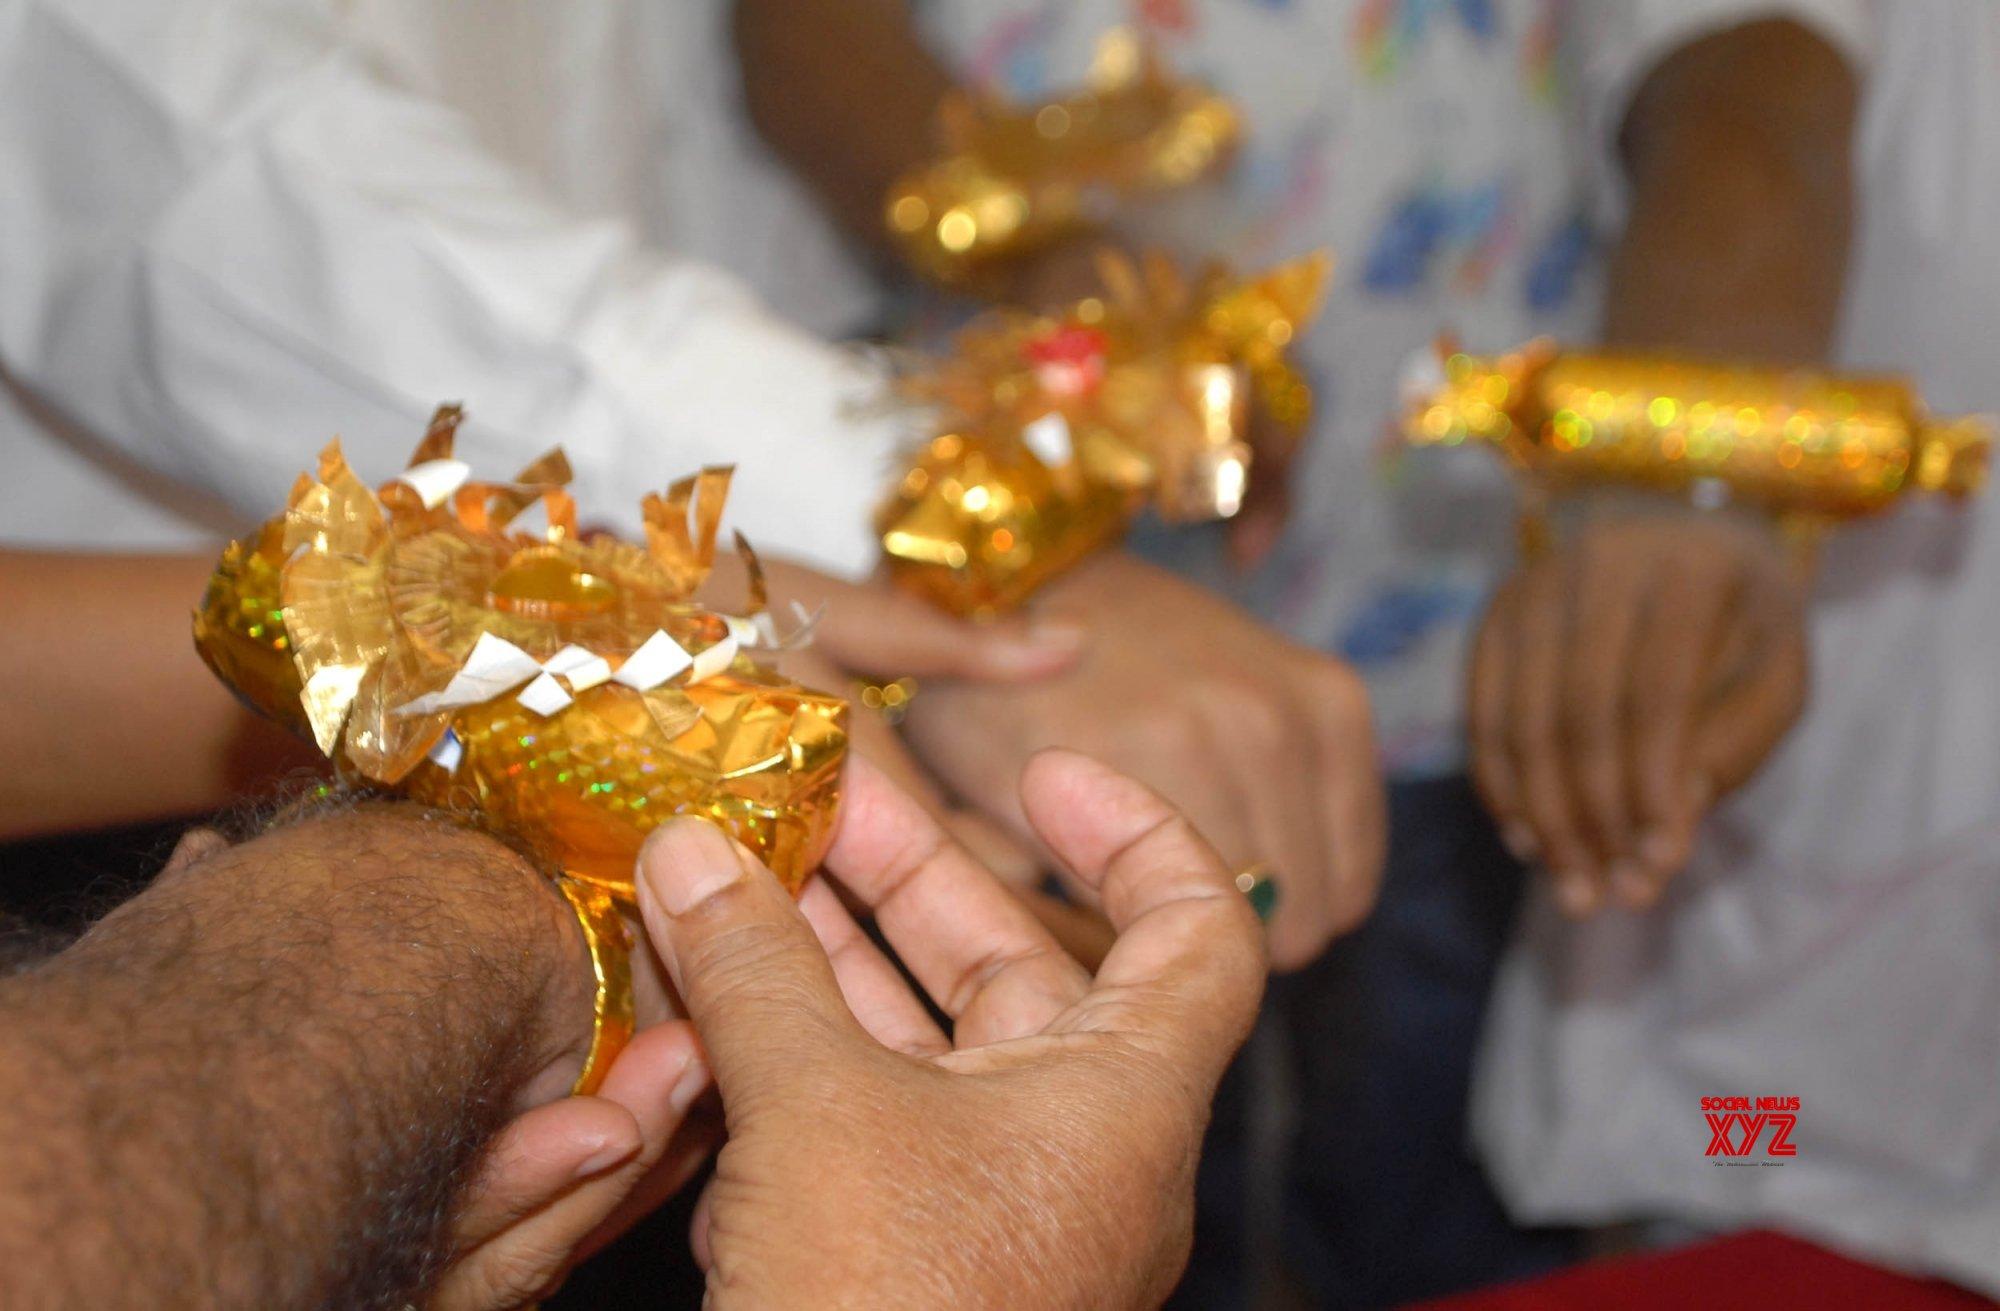 Kolkata: Automatic sanitiser rakhi launched at Thakurpukur Swadesh Basu Hospital #Gallery